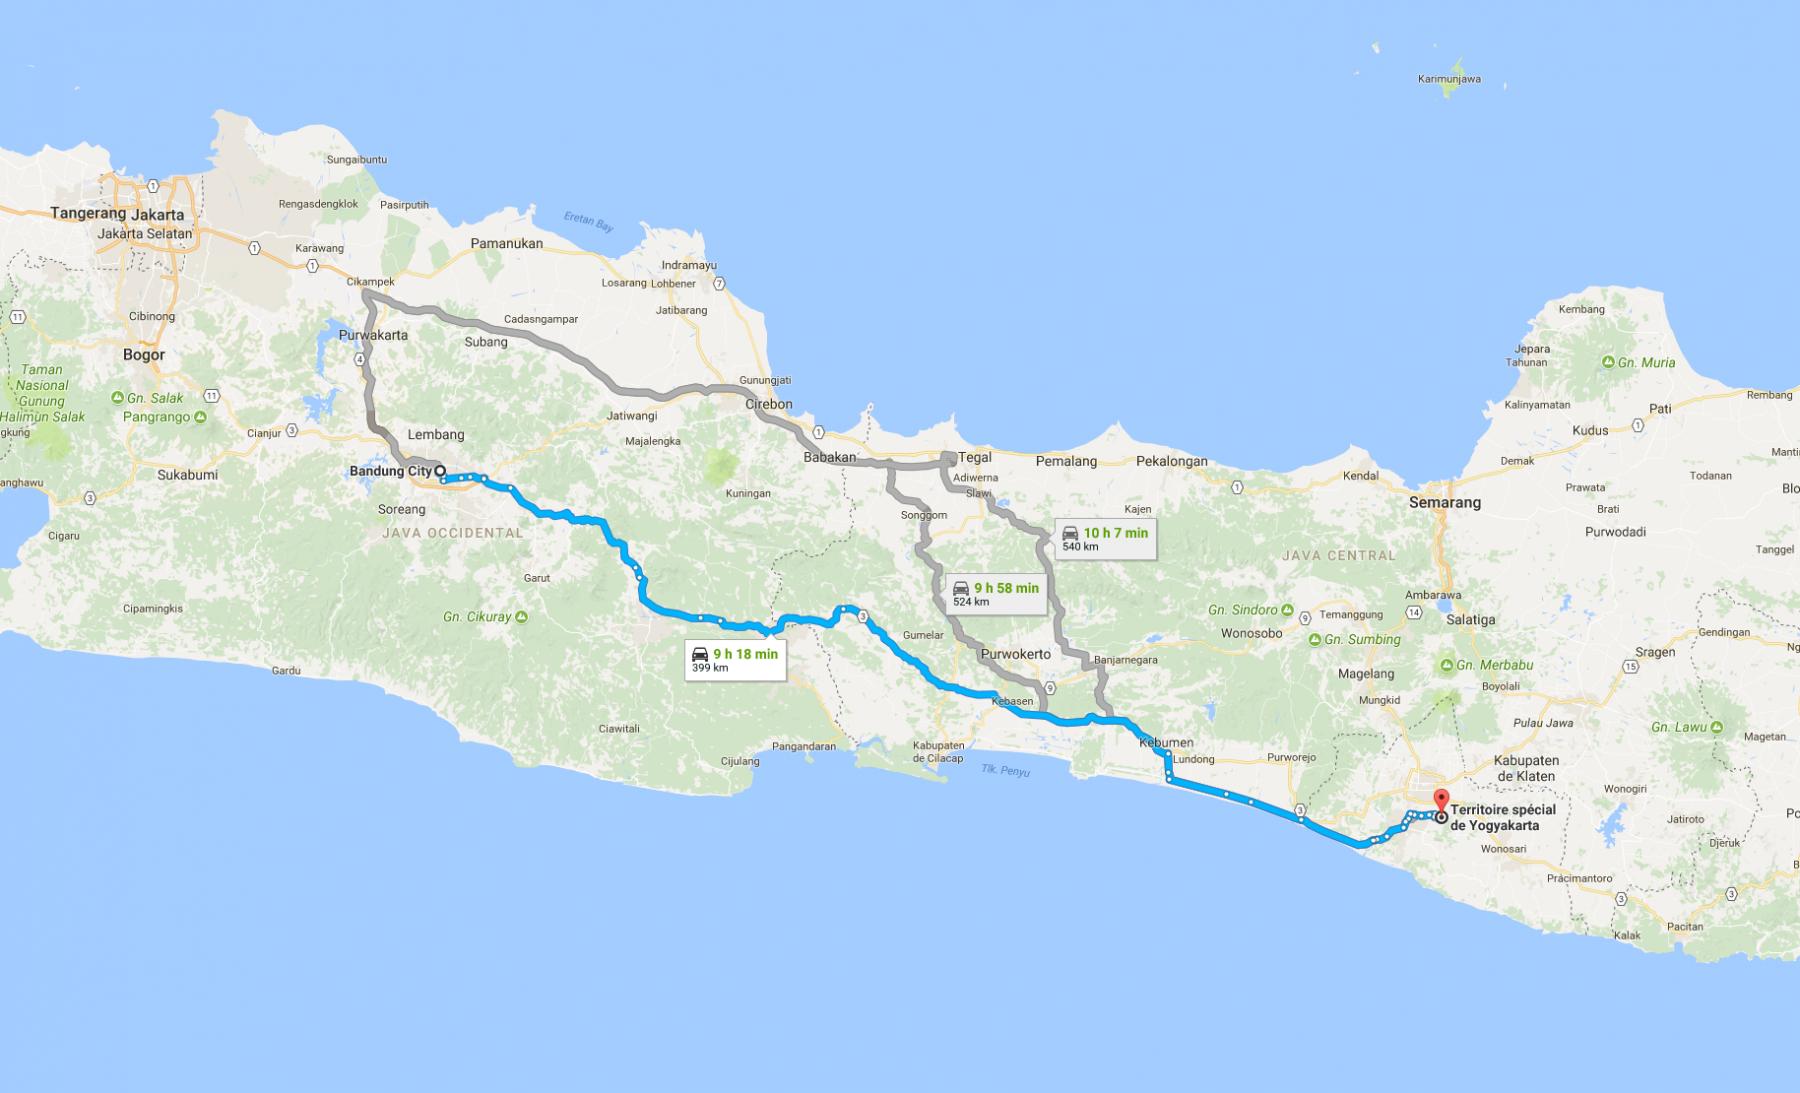 Trajet Bandung - Yogyakarta